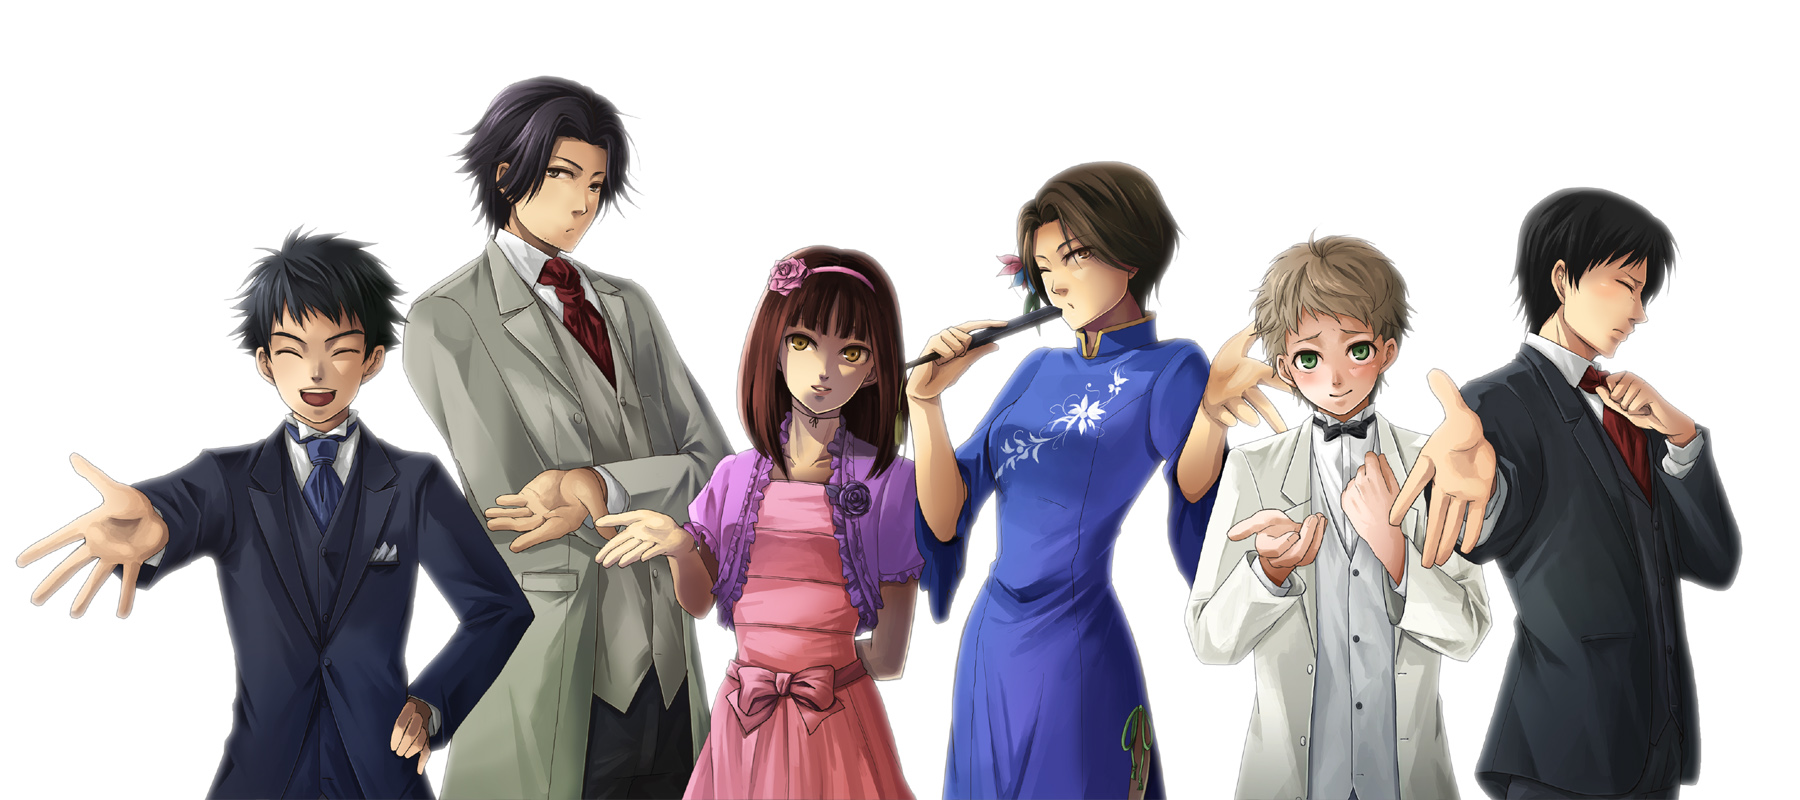 Tokimeki Memorial Girl S Side 3rd Story Image 461382 Zerochan Anime Image Board